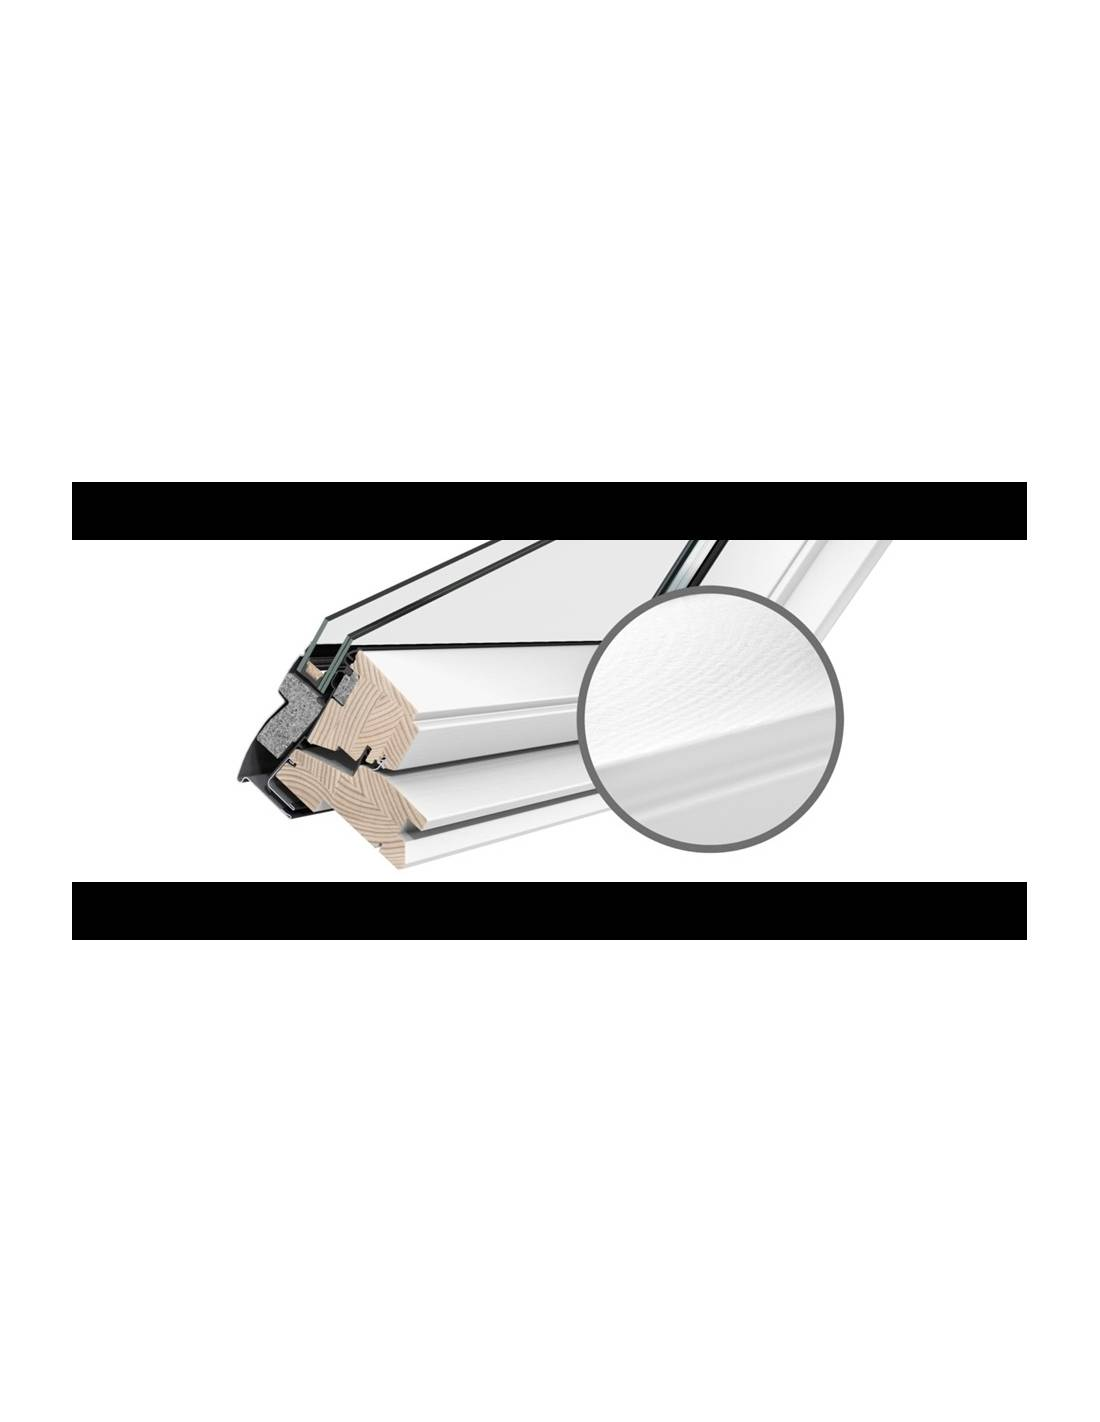 Velux ggl integra elettrica finestra a bilico elettrica for Prezzo velux integra